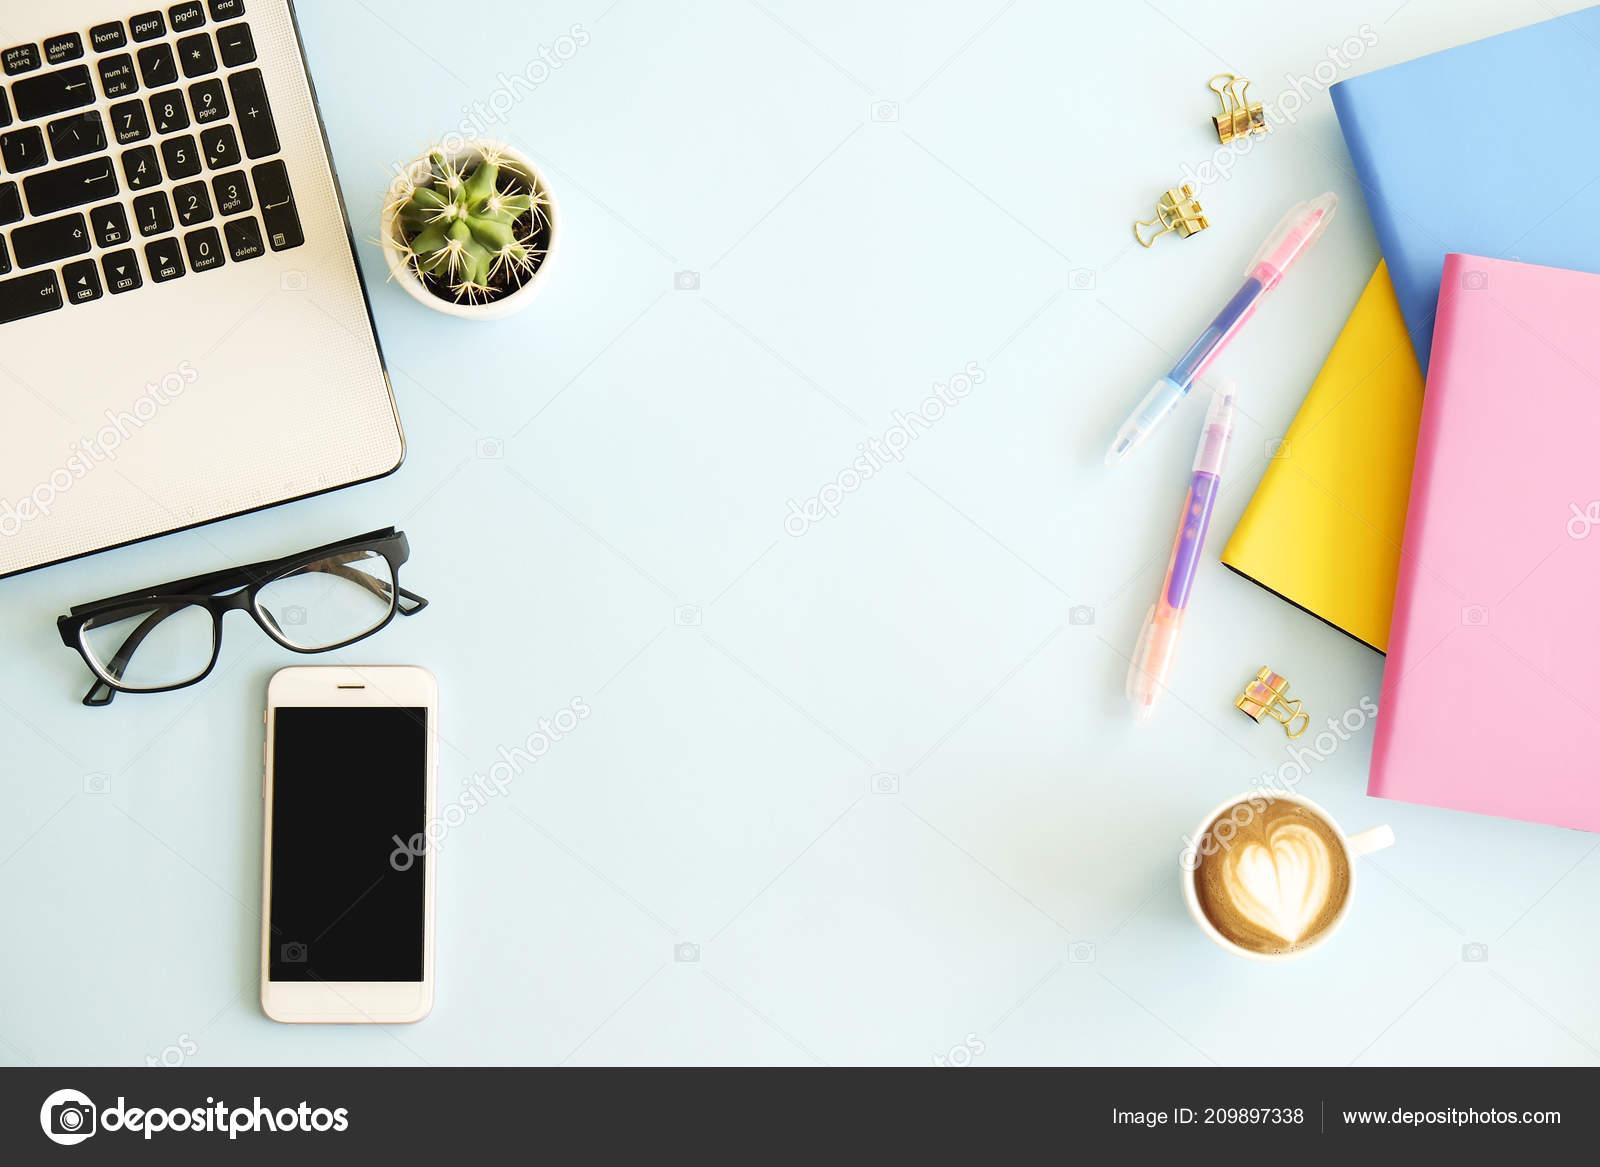 Plan De Travail Mobile office workplace laptop multiple colorful notebooks blank